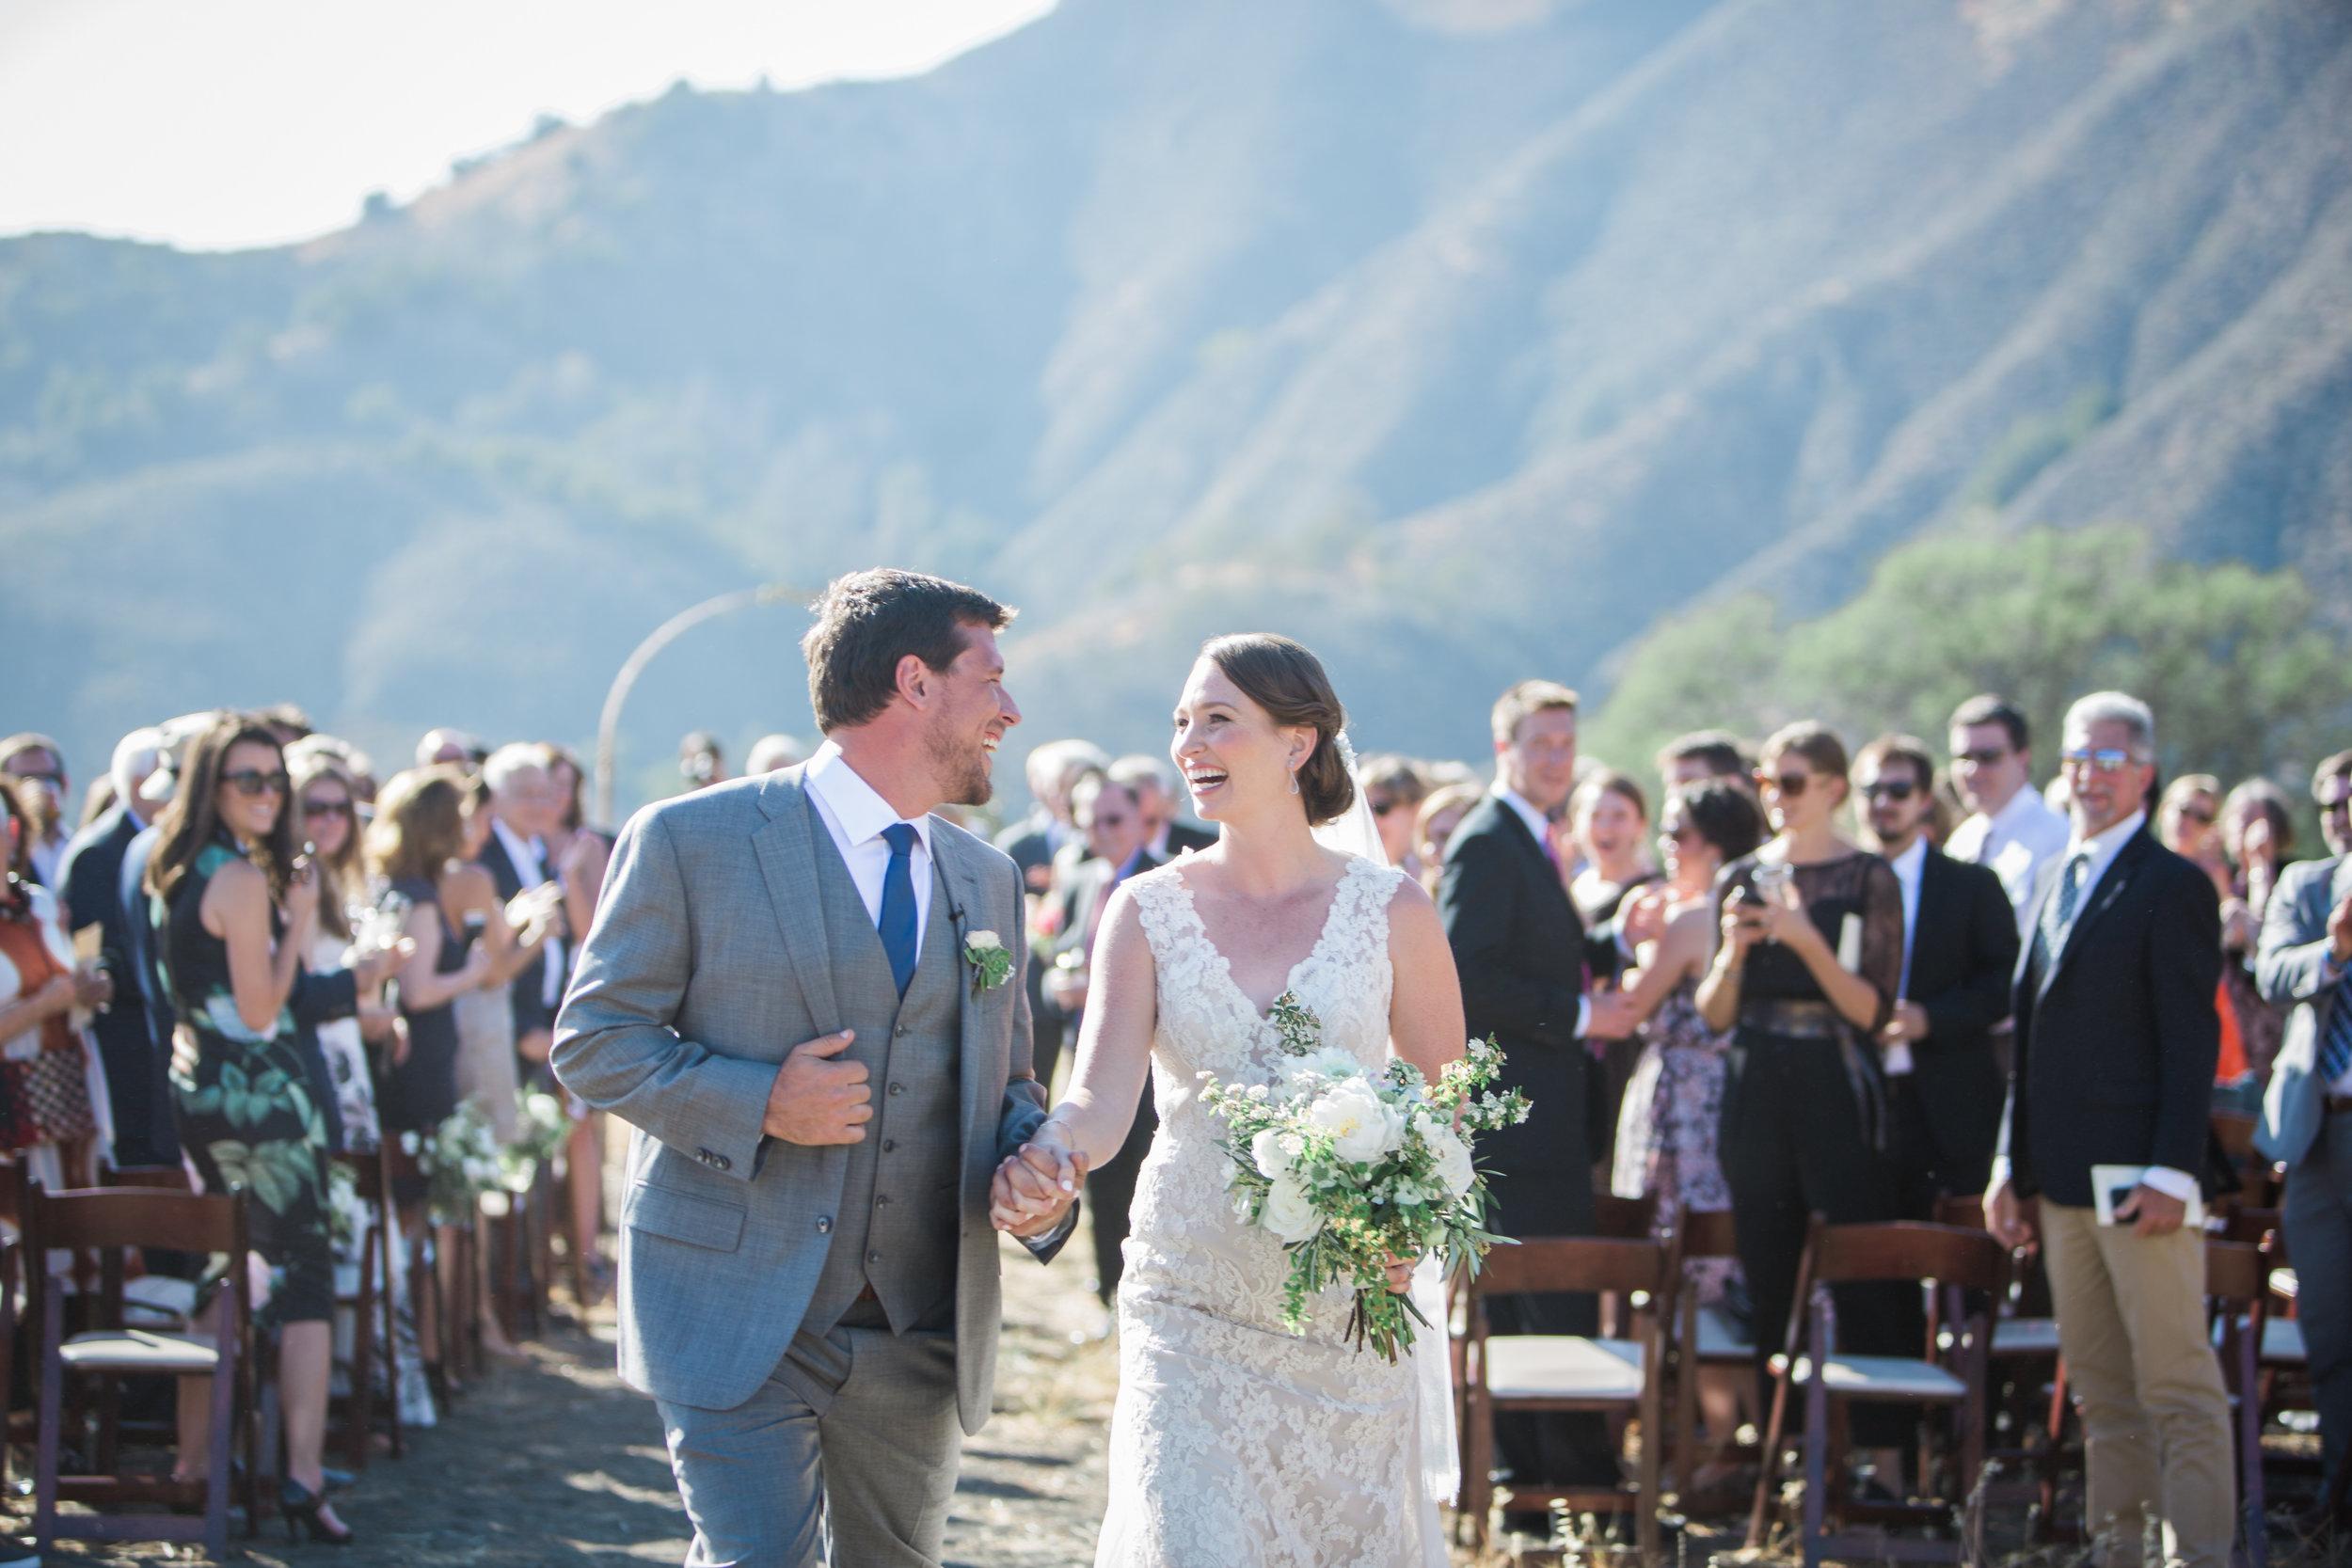 www.santabarbarawedding.com | Kiel Rucker Photography | Joelle Charming Wedding Planner | Figueroa Mountain Farmhouse | Ella & Louie Flowers | Ceremony